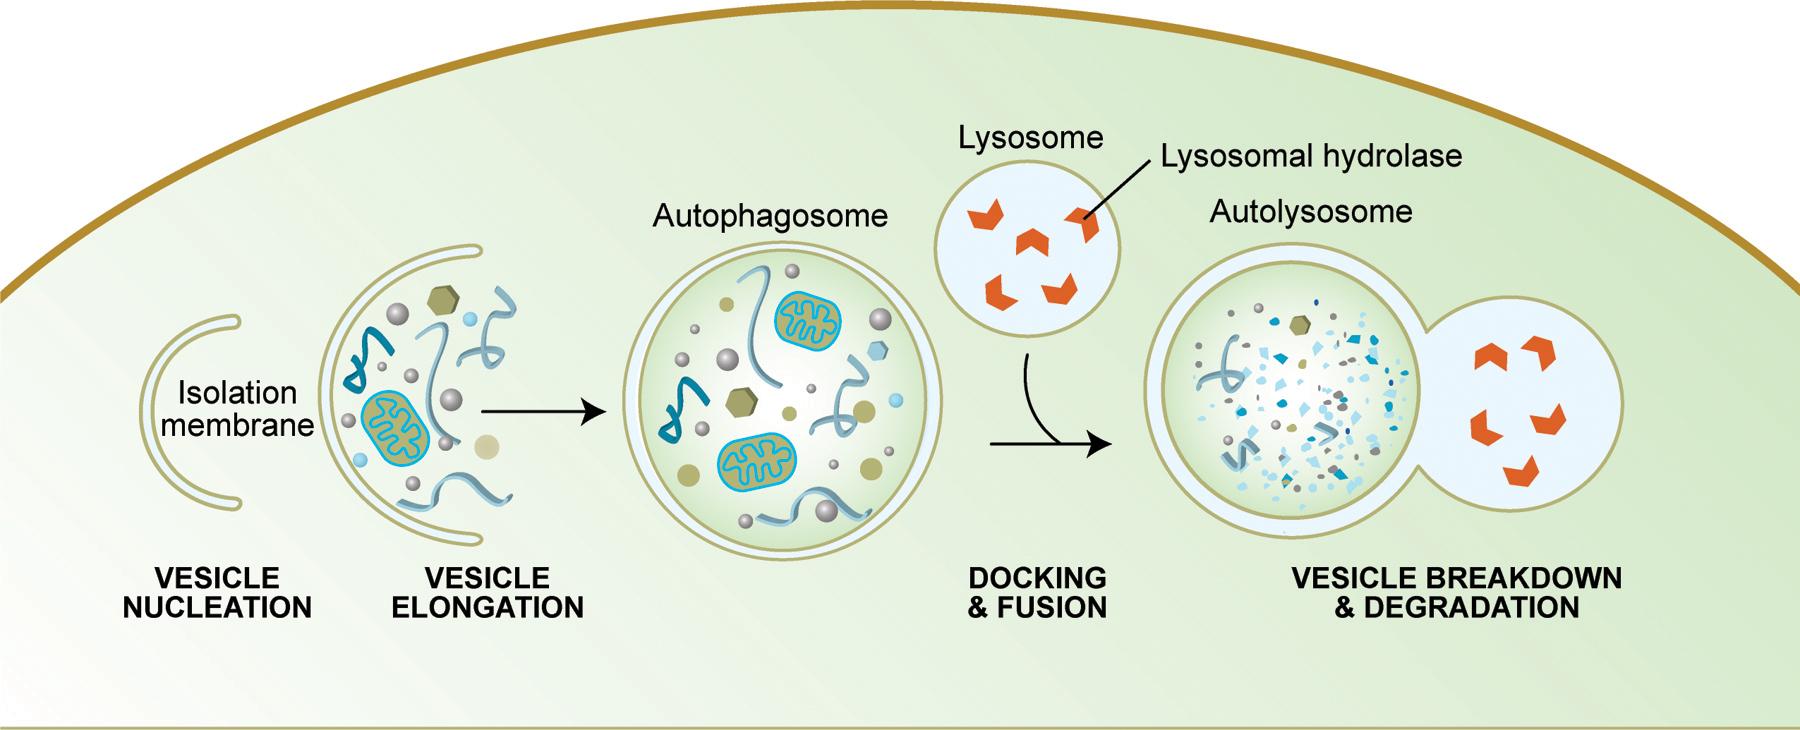 Autofagosytoosi